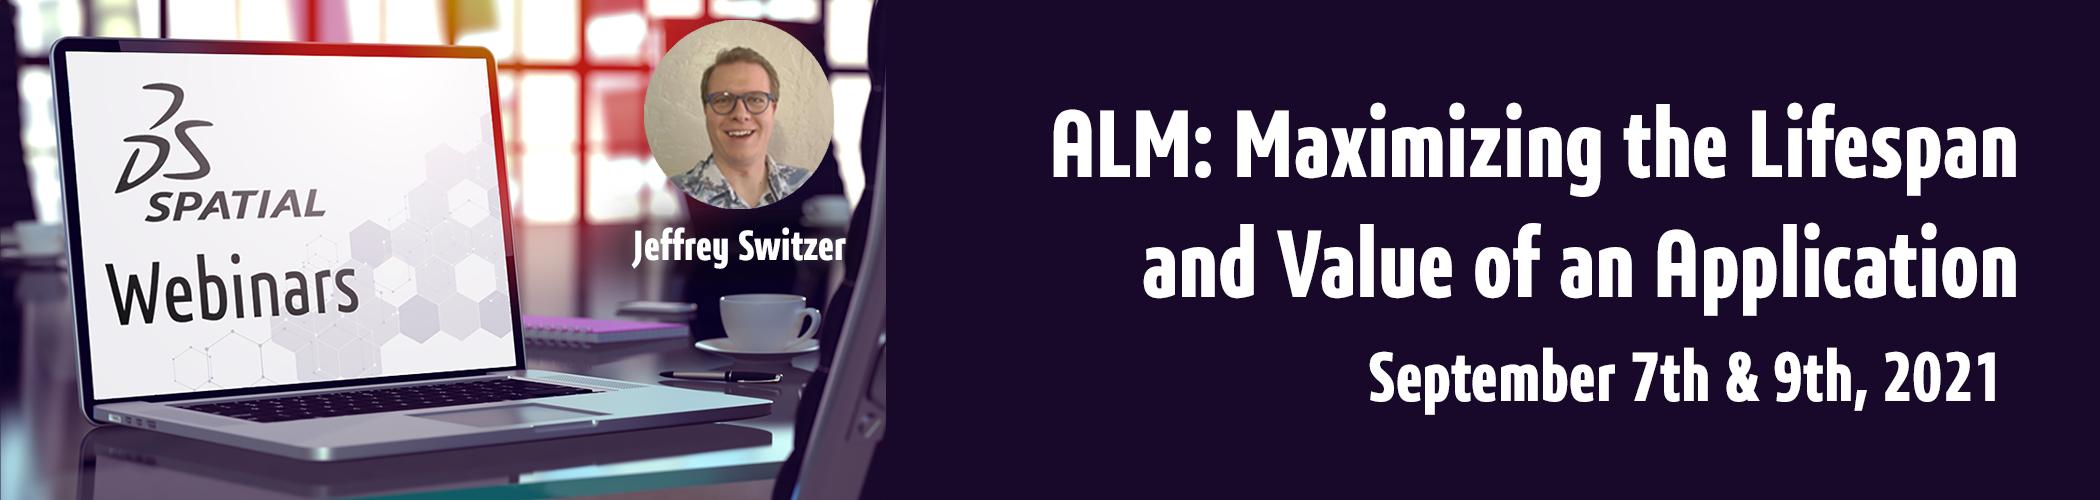 Website Banner ALM Maximizing Lifespan Webinar